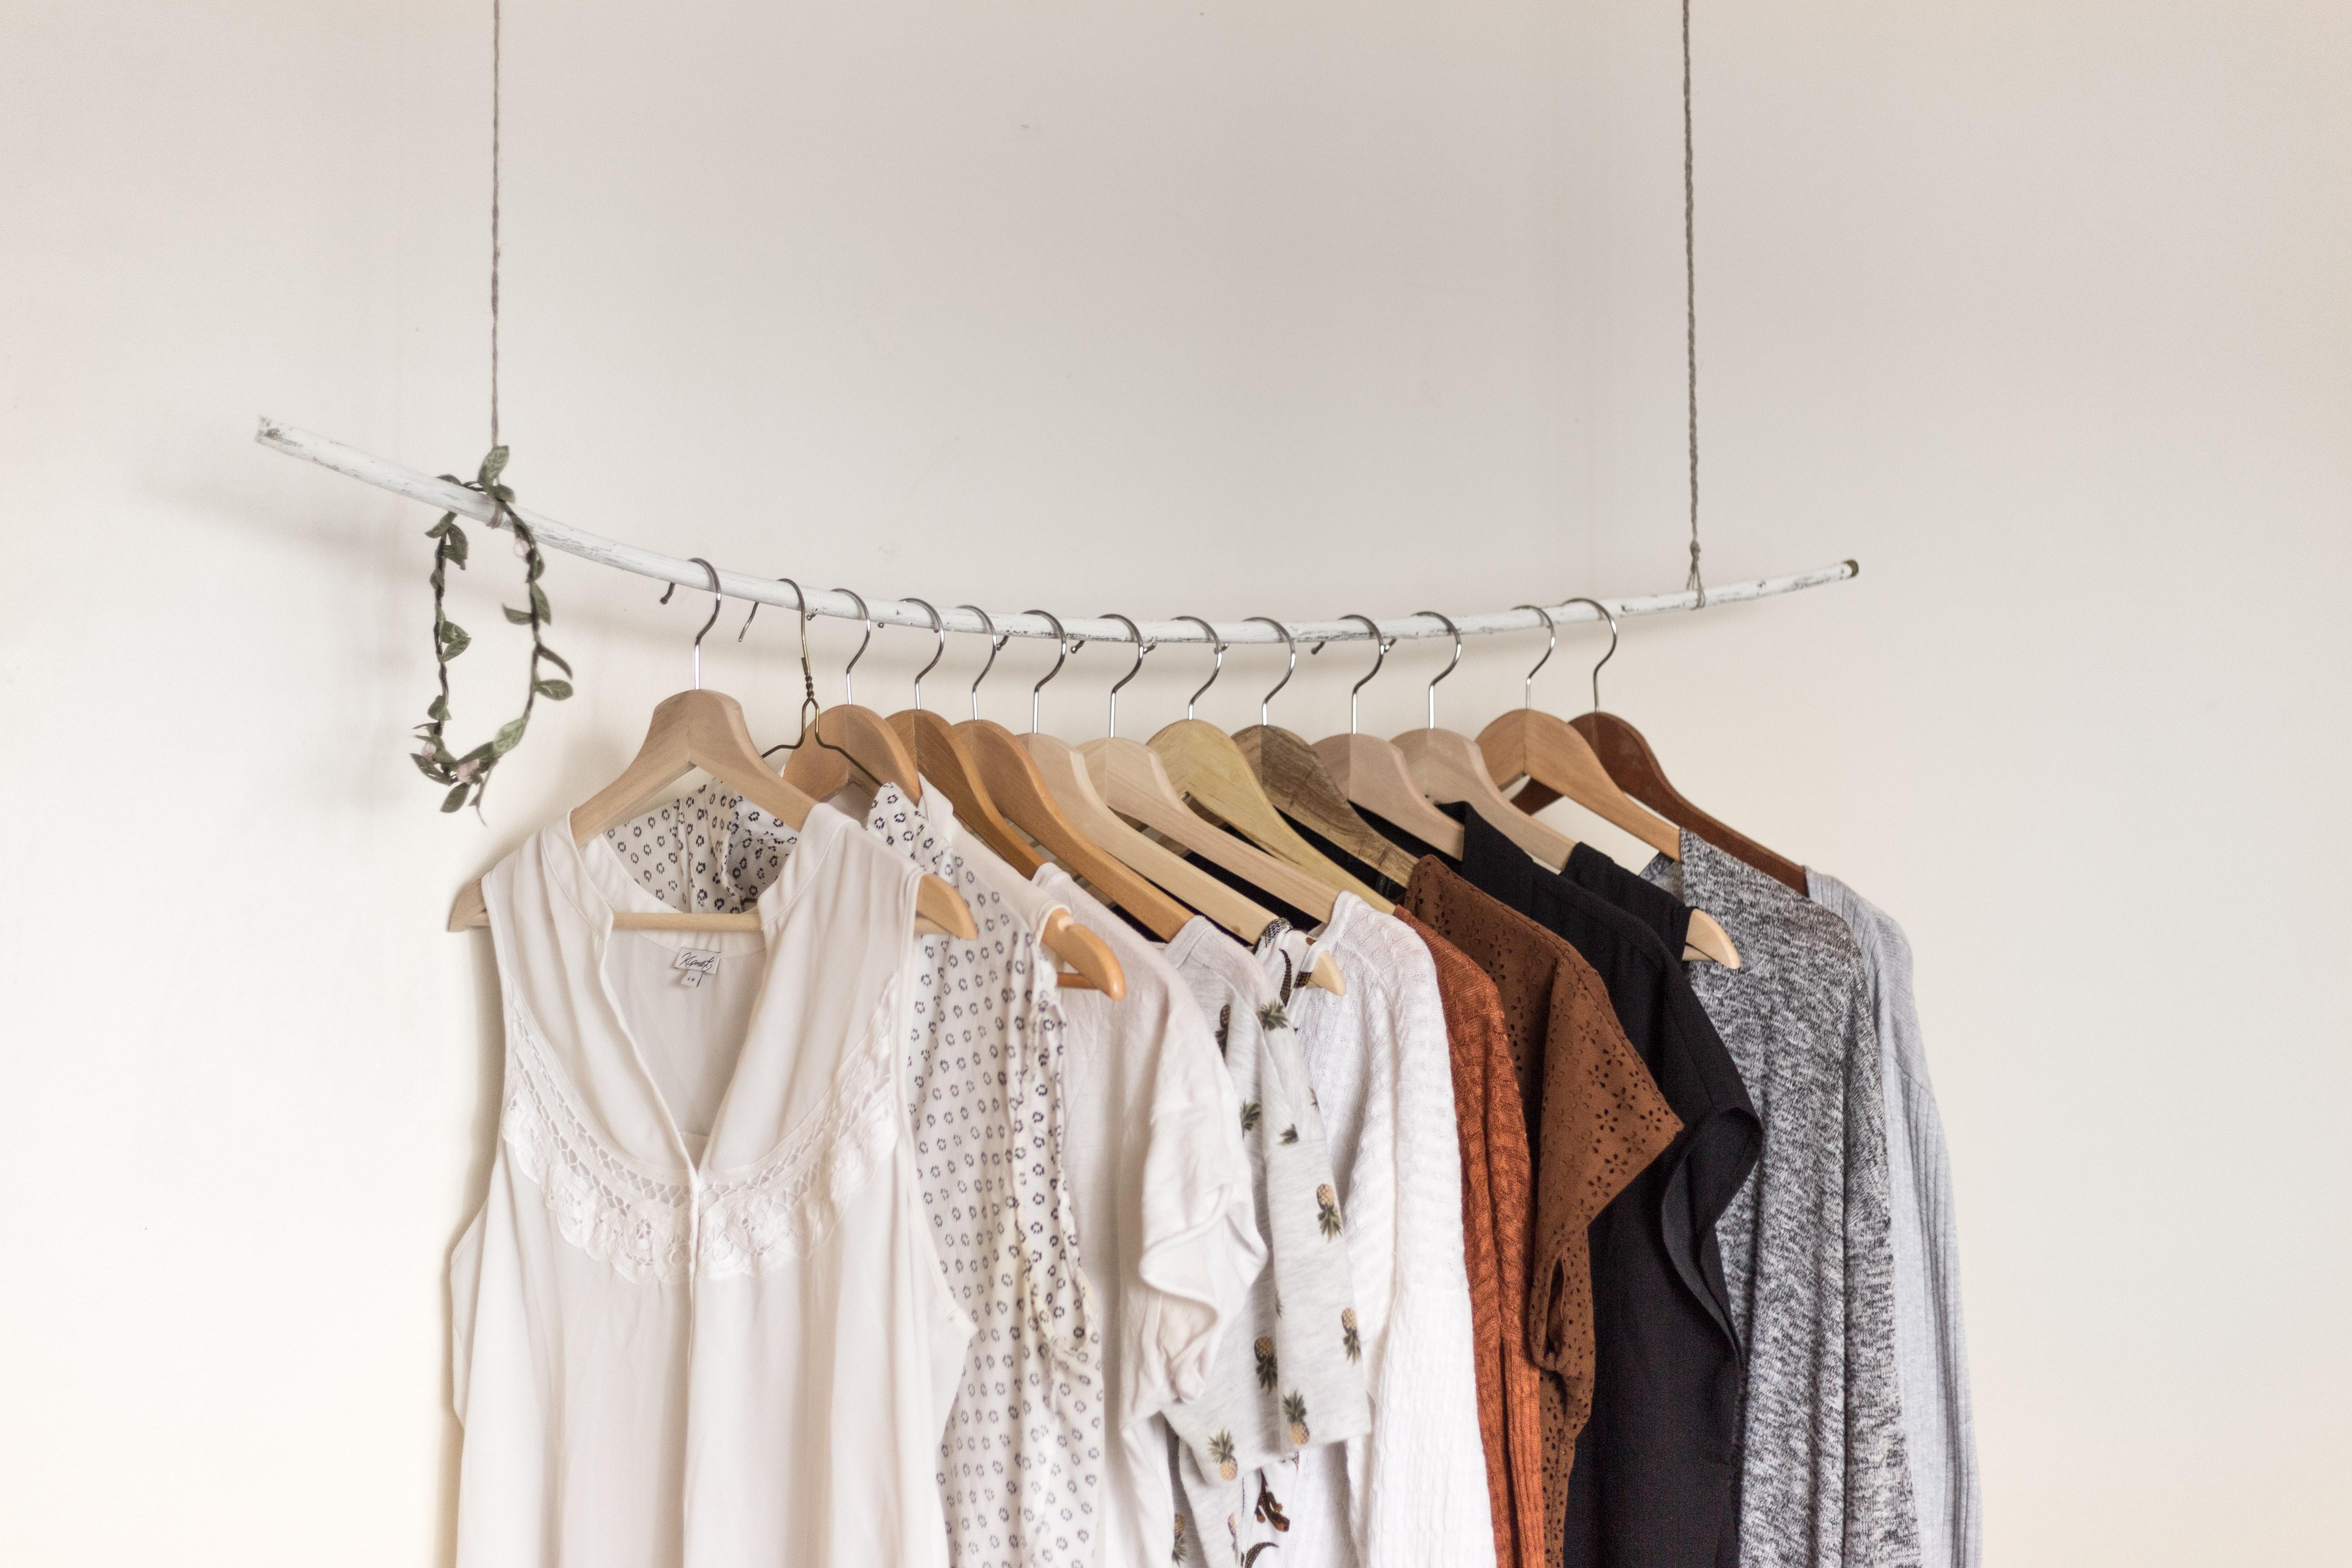 Christian Dior – manden bag 'new look'